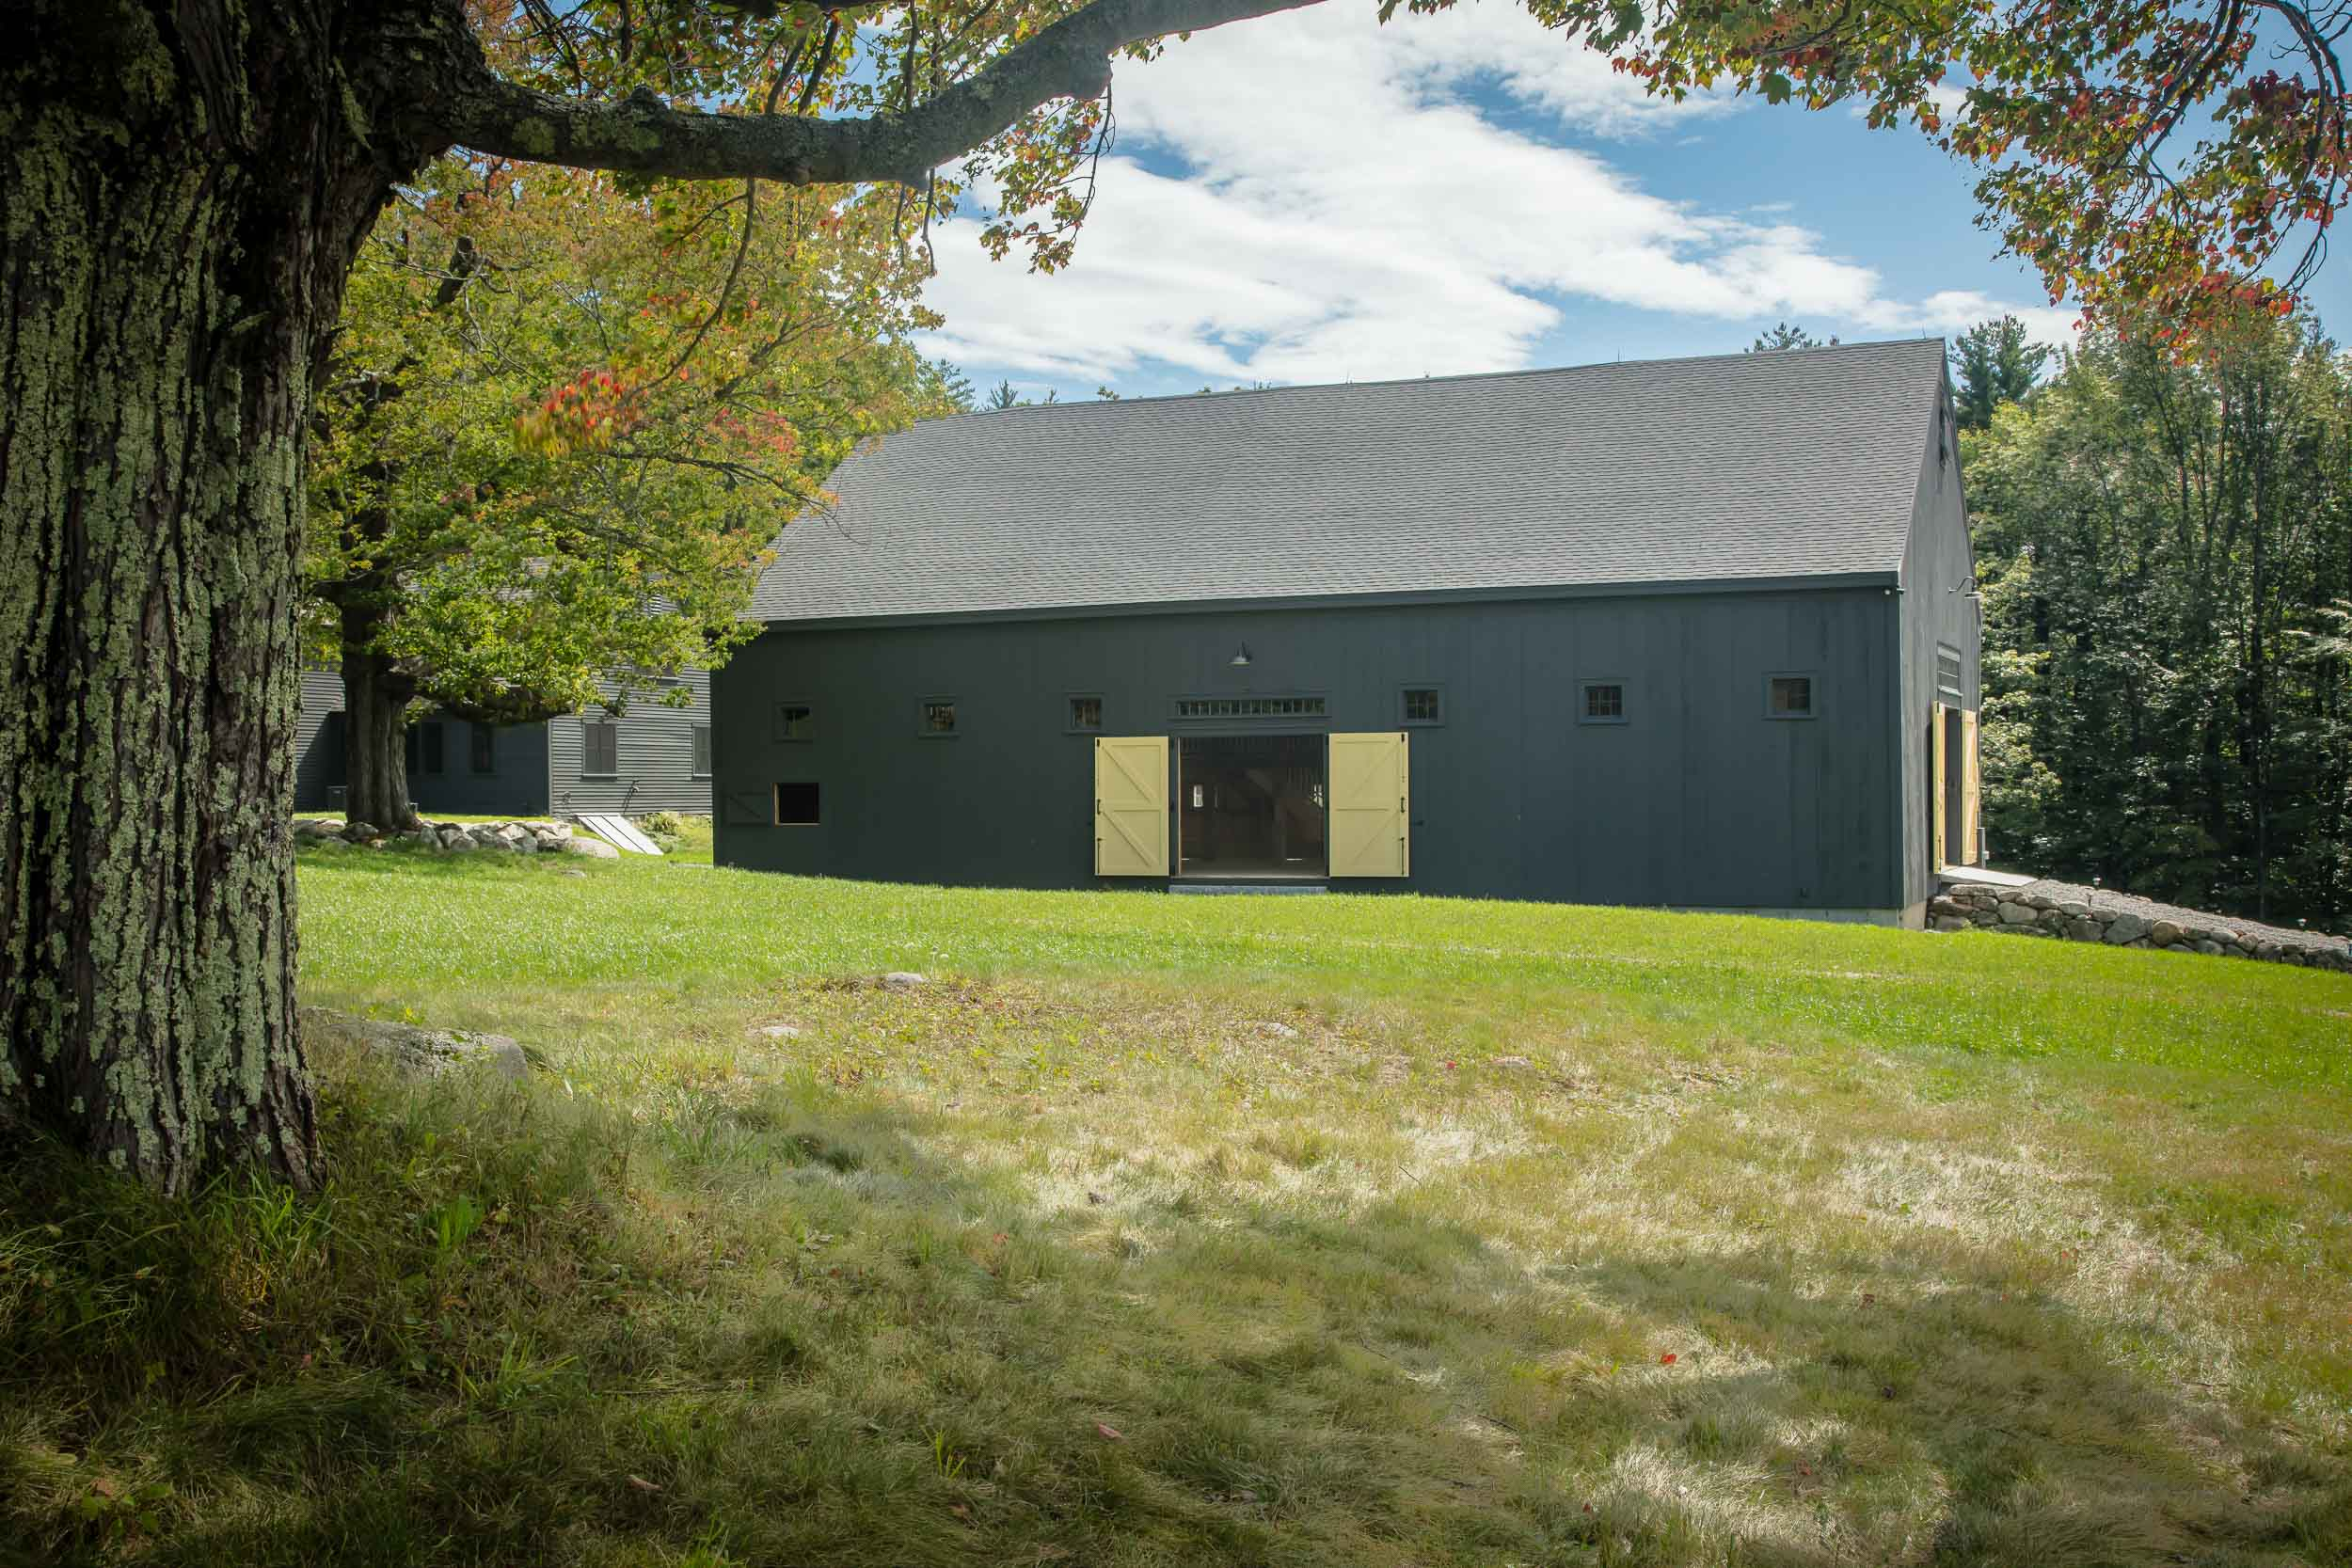 Lakes Region Rustic Barn